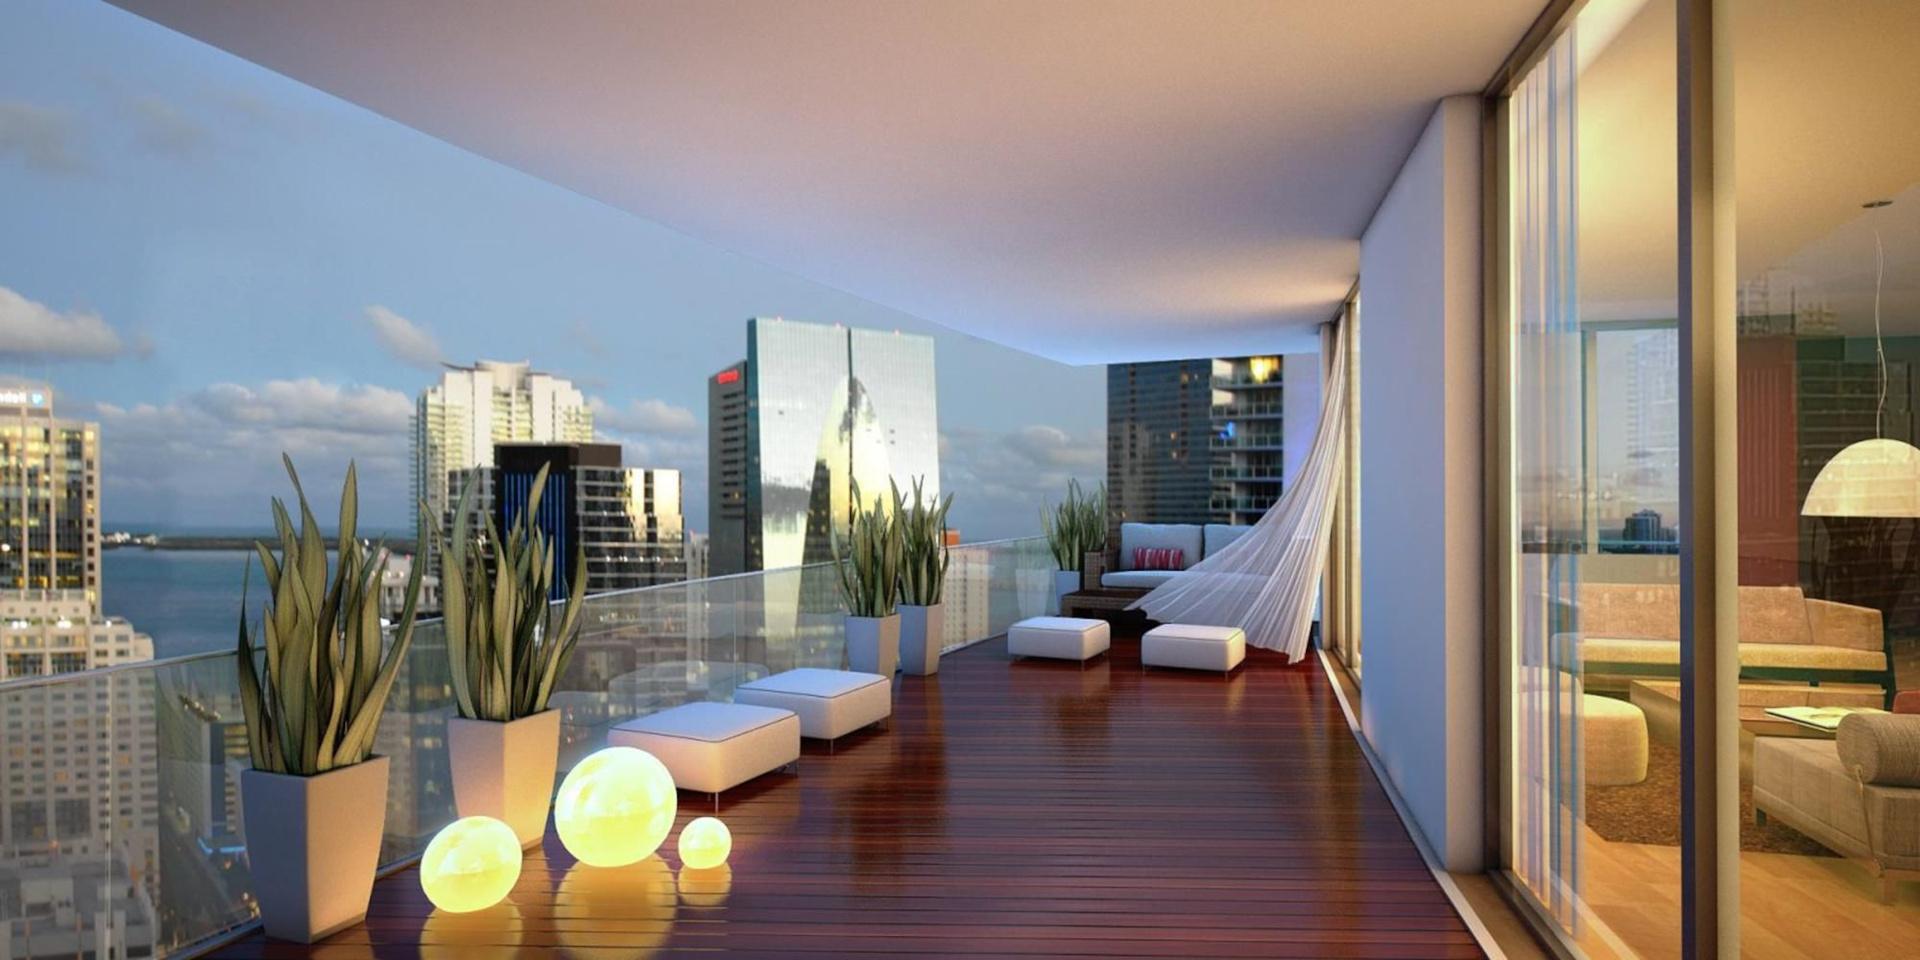 Luxury balcony in a tower